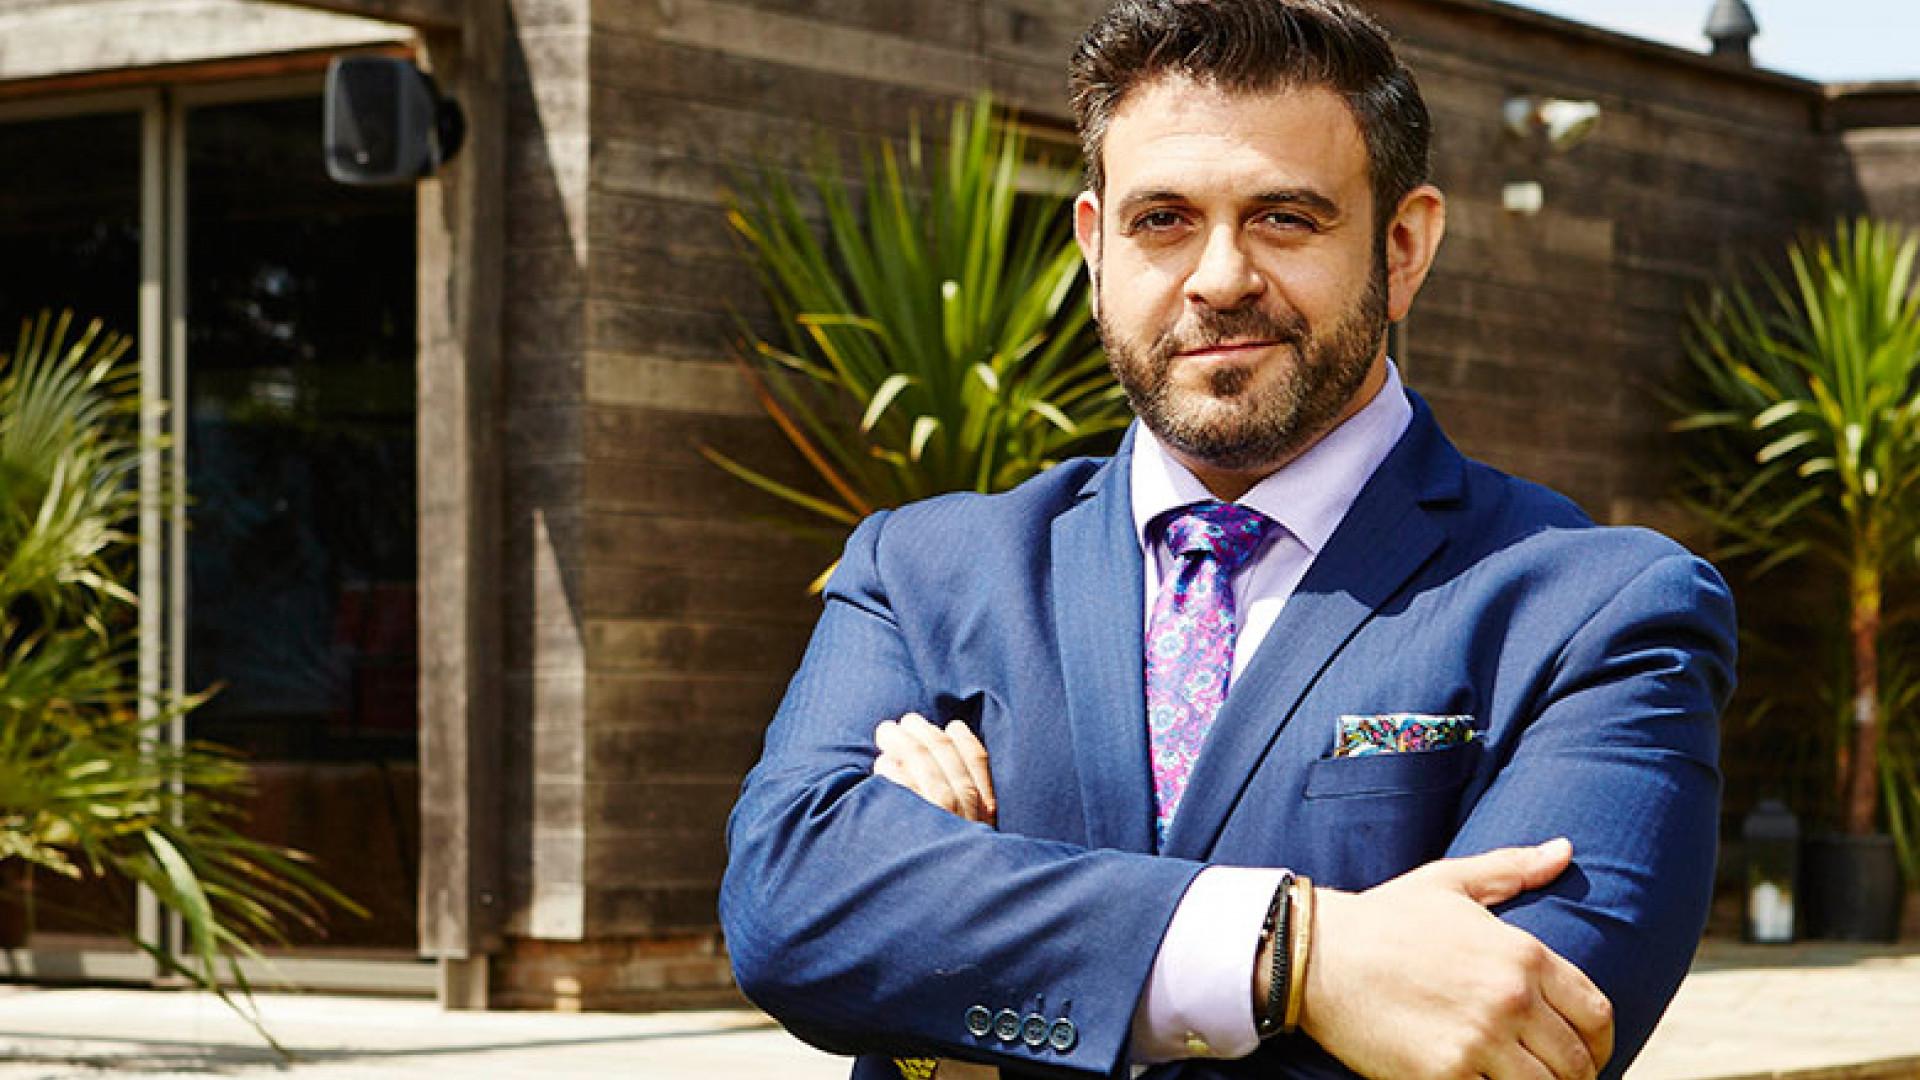 Adam Champ q&a: adam richman on new series bbq champ | foodism